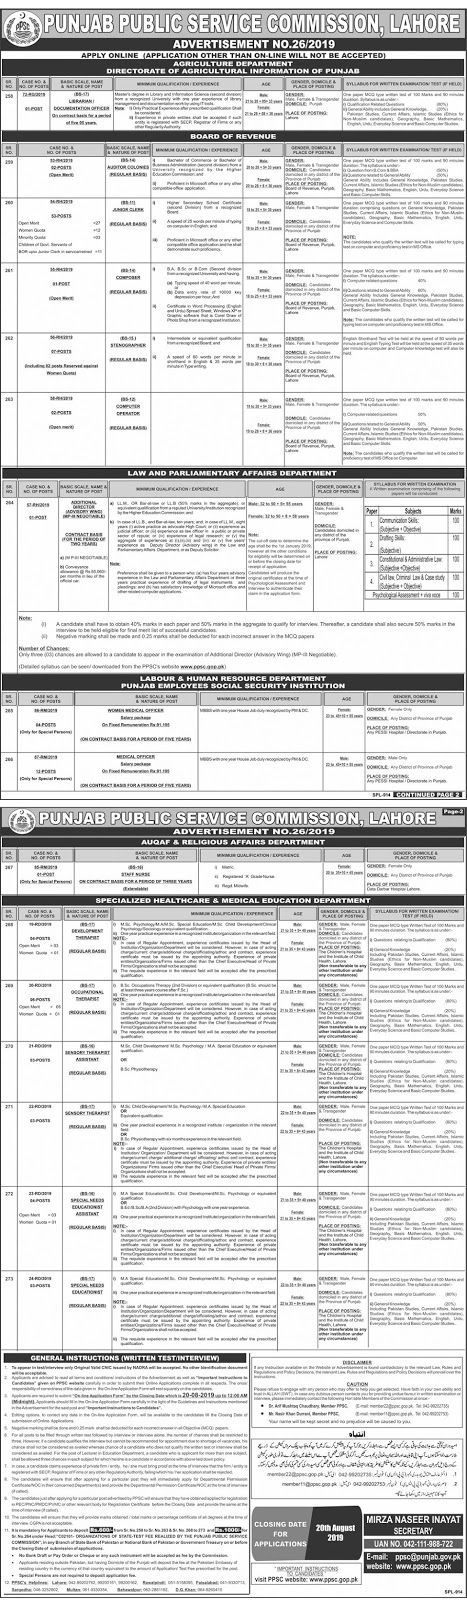 PPSC Jobs Advertisement No 26/2019 August